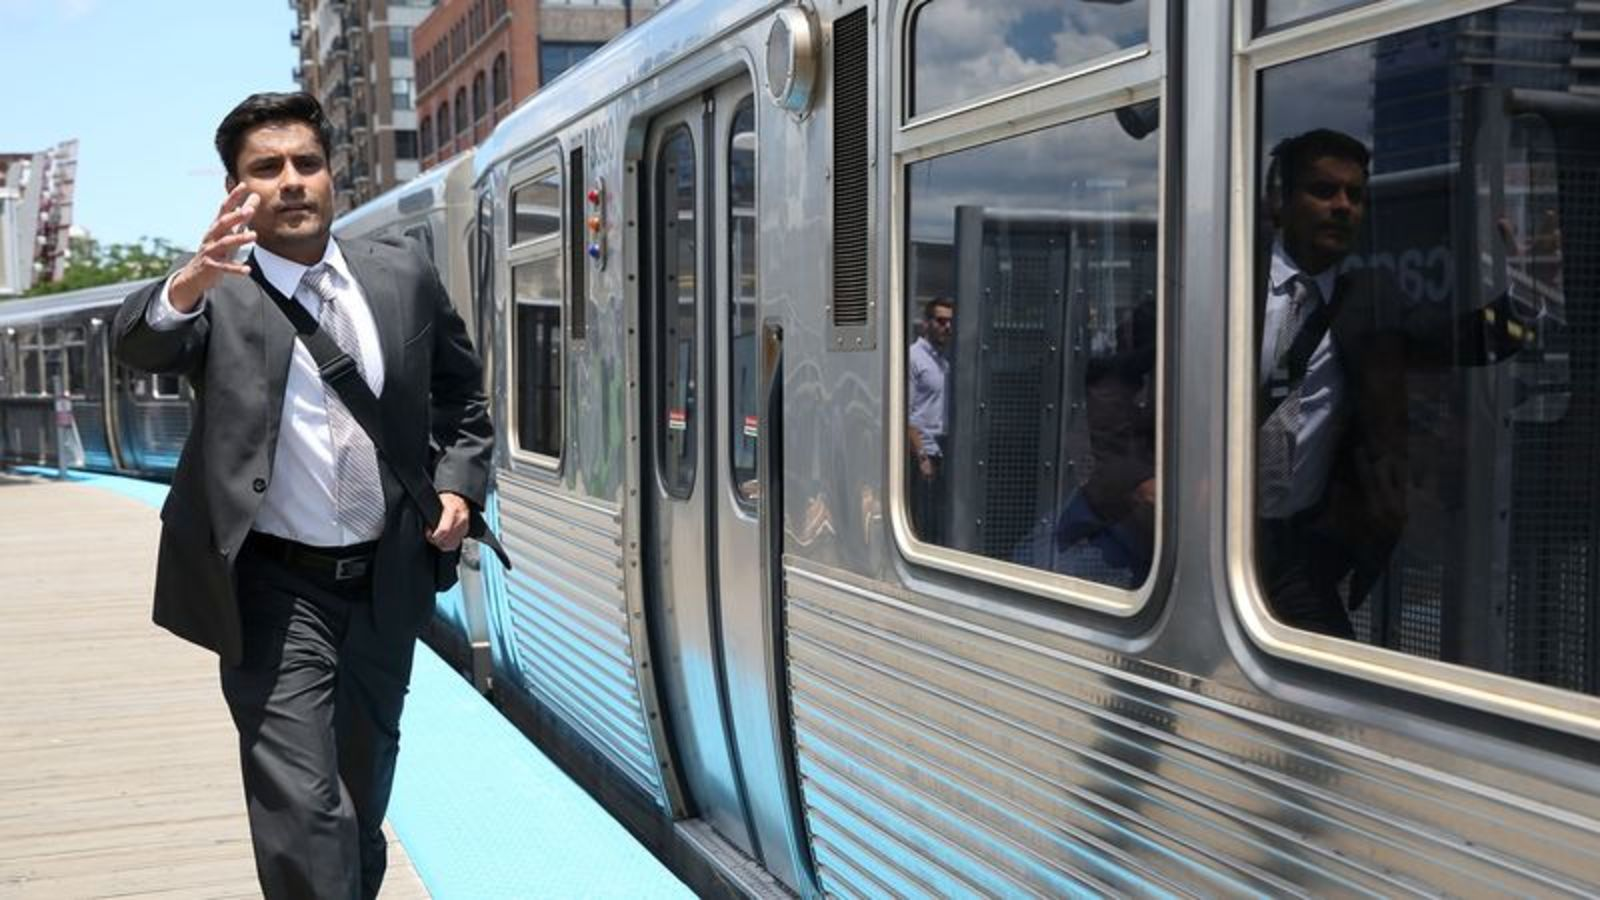 Man Running Toward Departing Train Must Have Finally Realized He Loves Her https://t.co/66TKy4vzuZ https://t.co/YllNHzFdKw